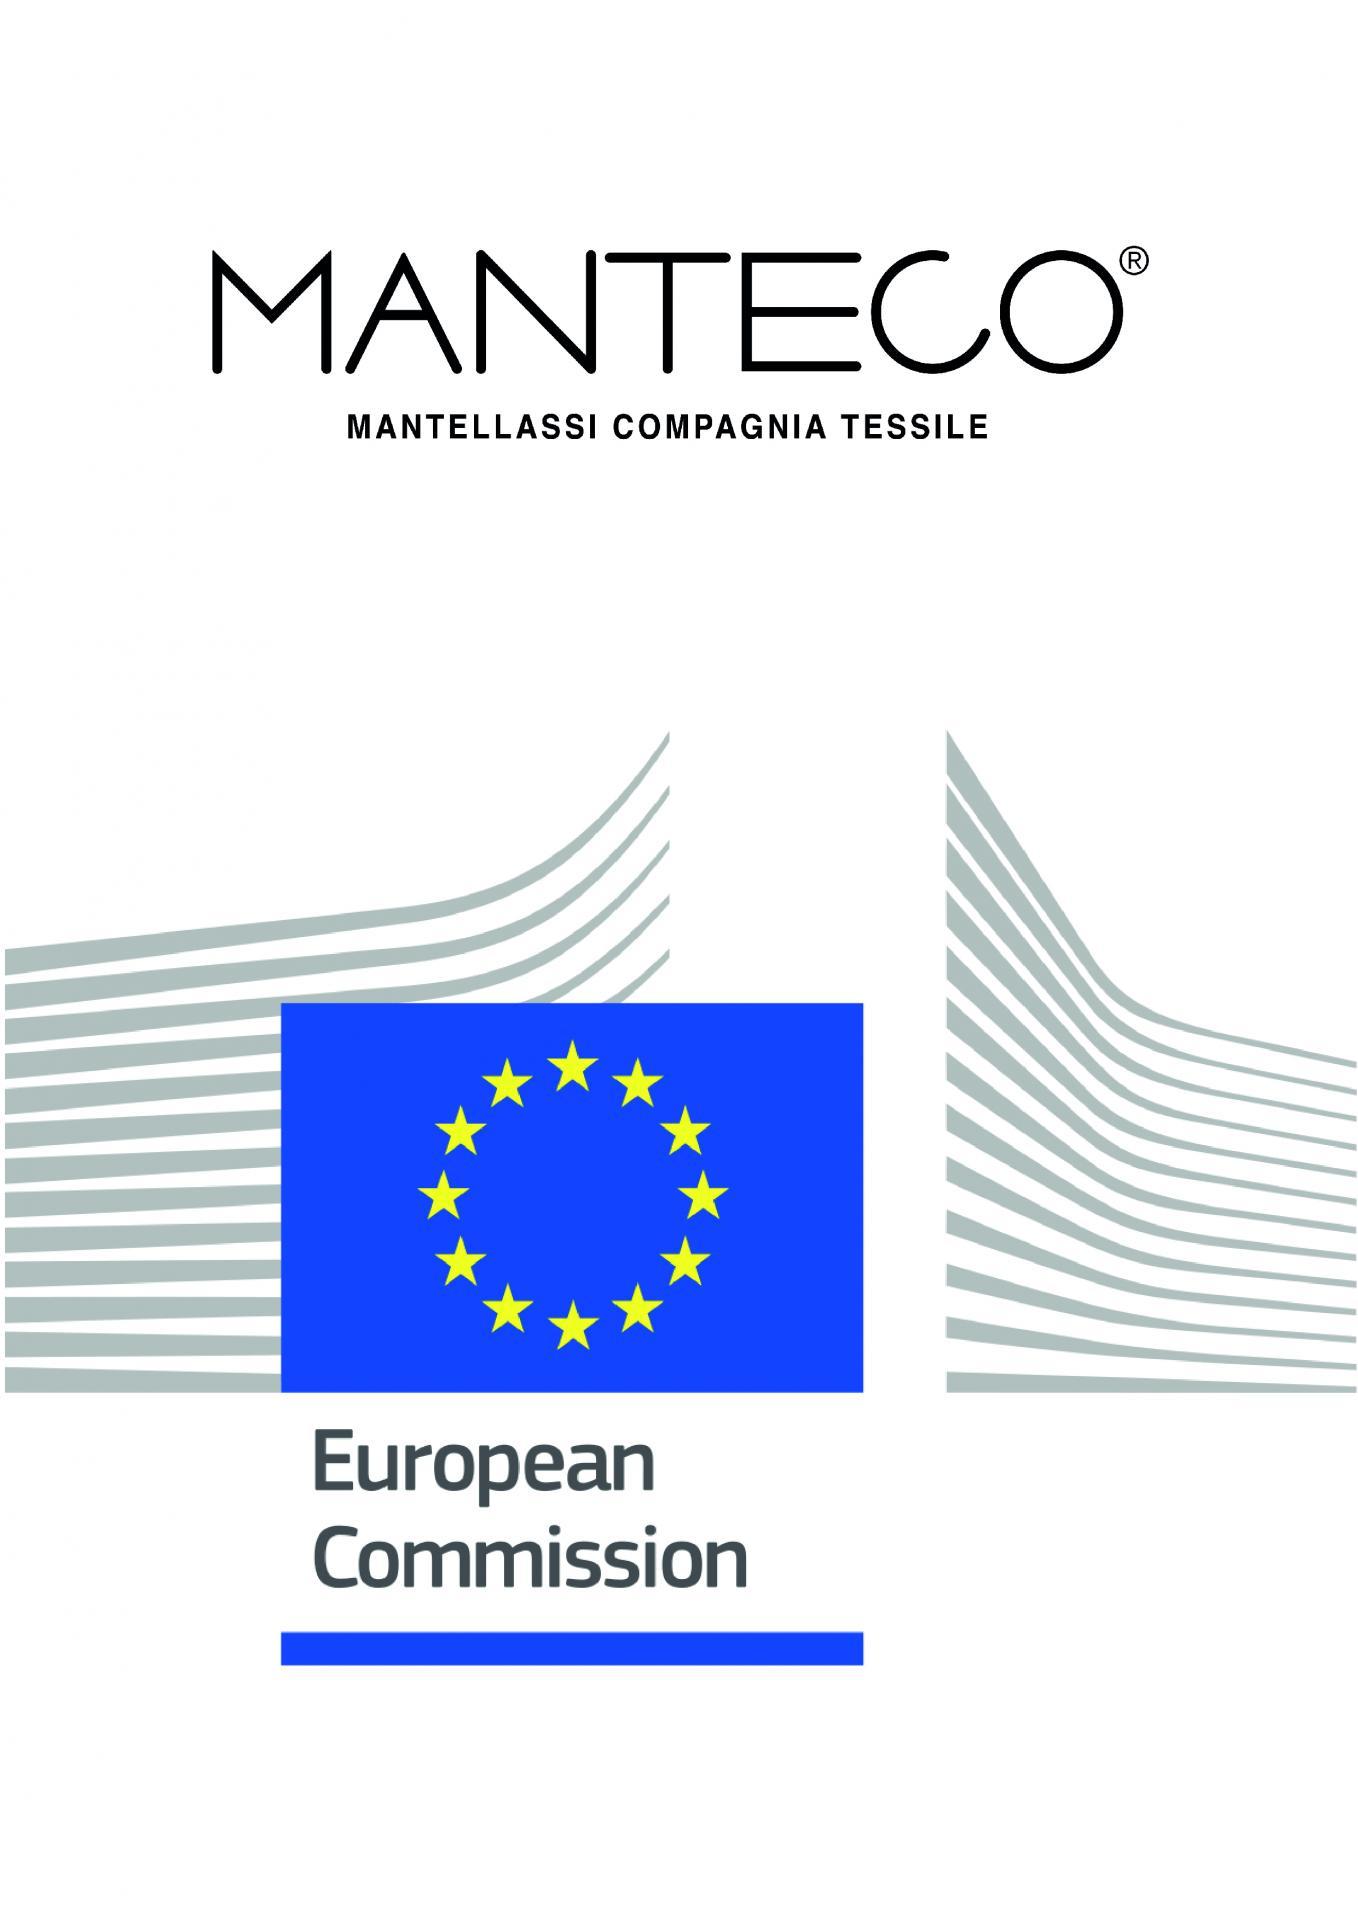 European Commissioner Elżbieta Bieńkowska visits Manteco